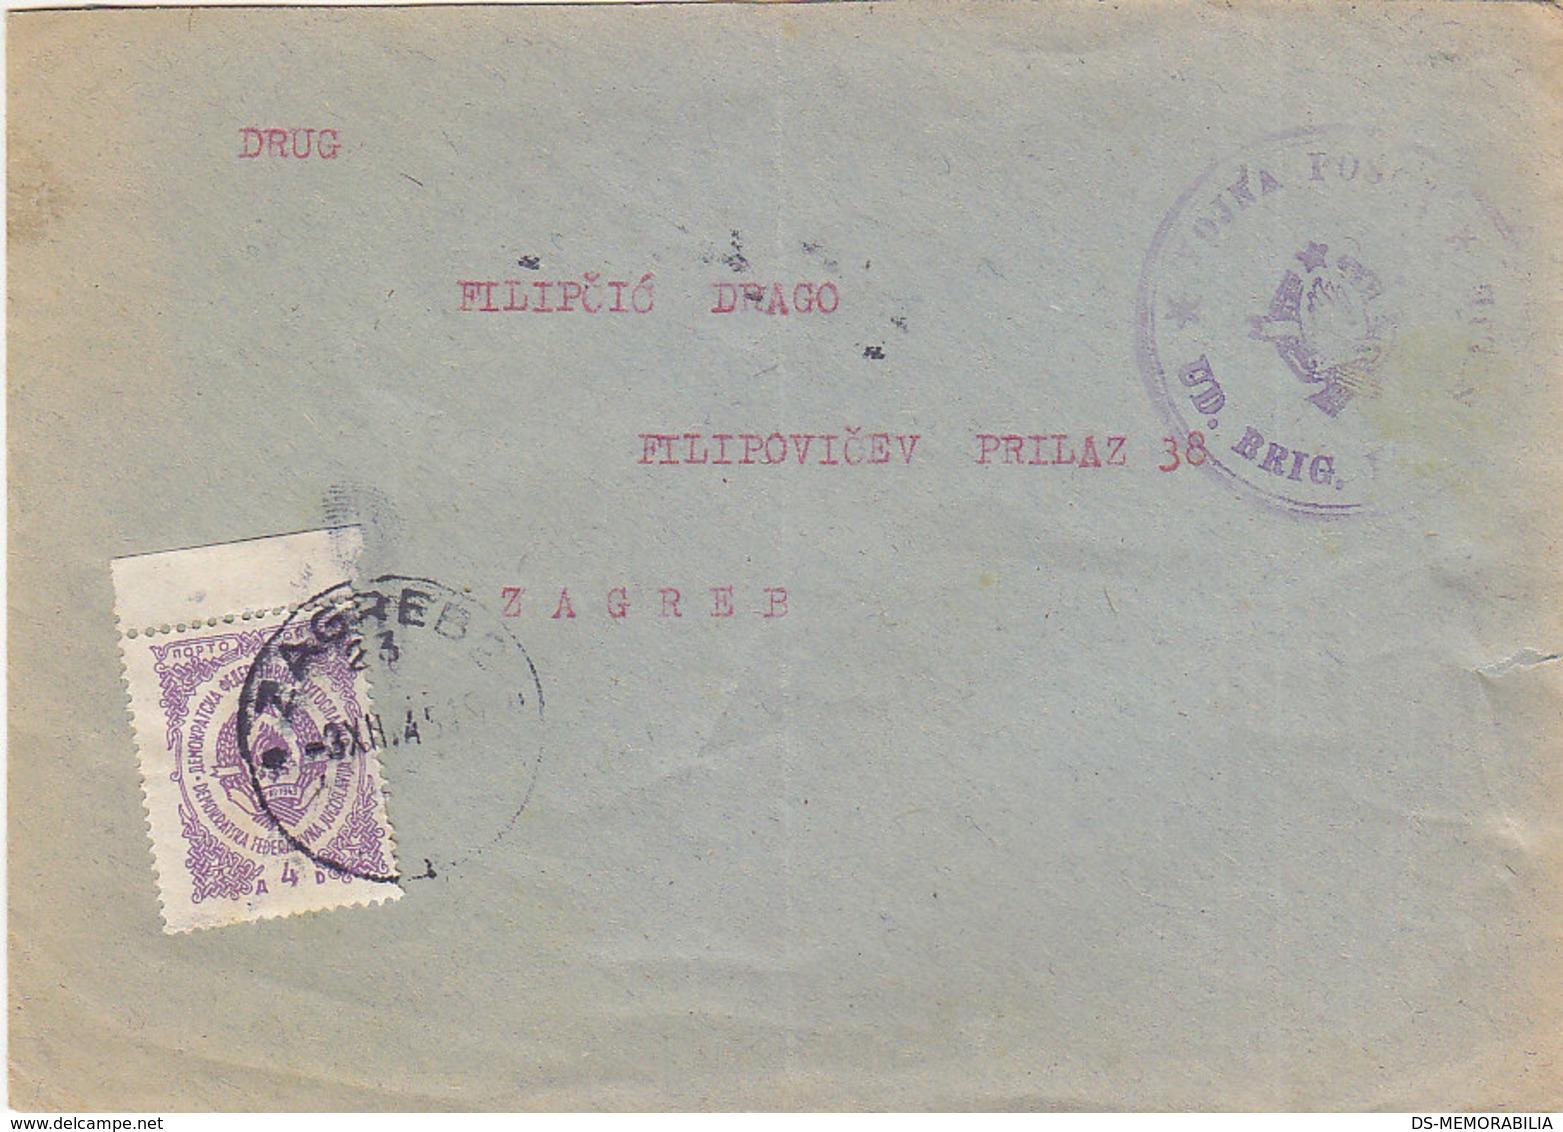 Yugoslavia Yugoslav Army Military Mail VOJNA POSTA , Postage Due Zagreb 1945 - 1945-1992 Sozialistische Föderative Republik Jugoslawien